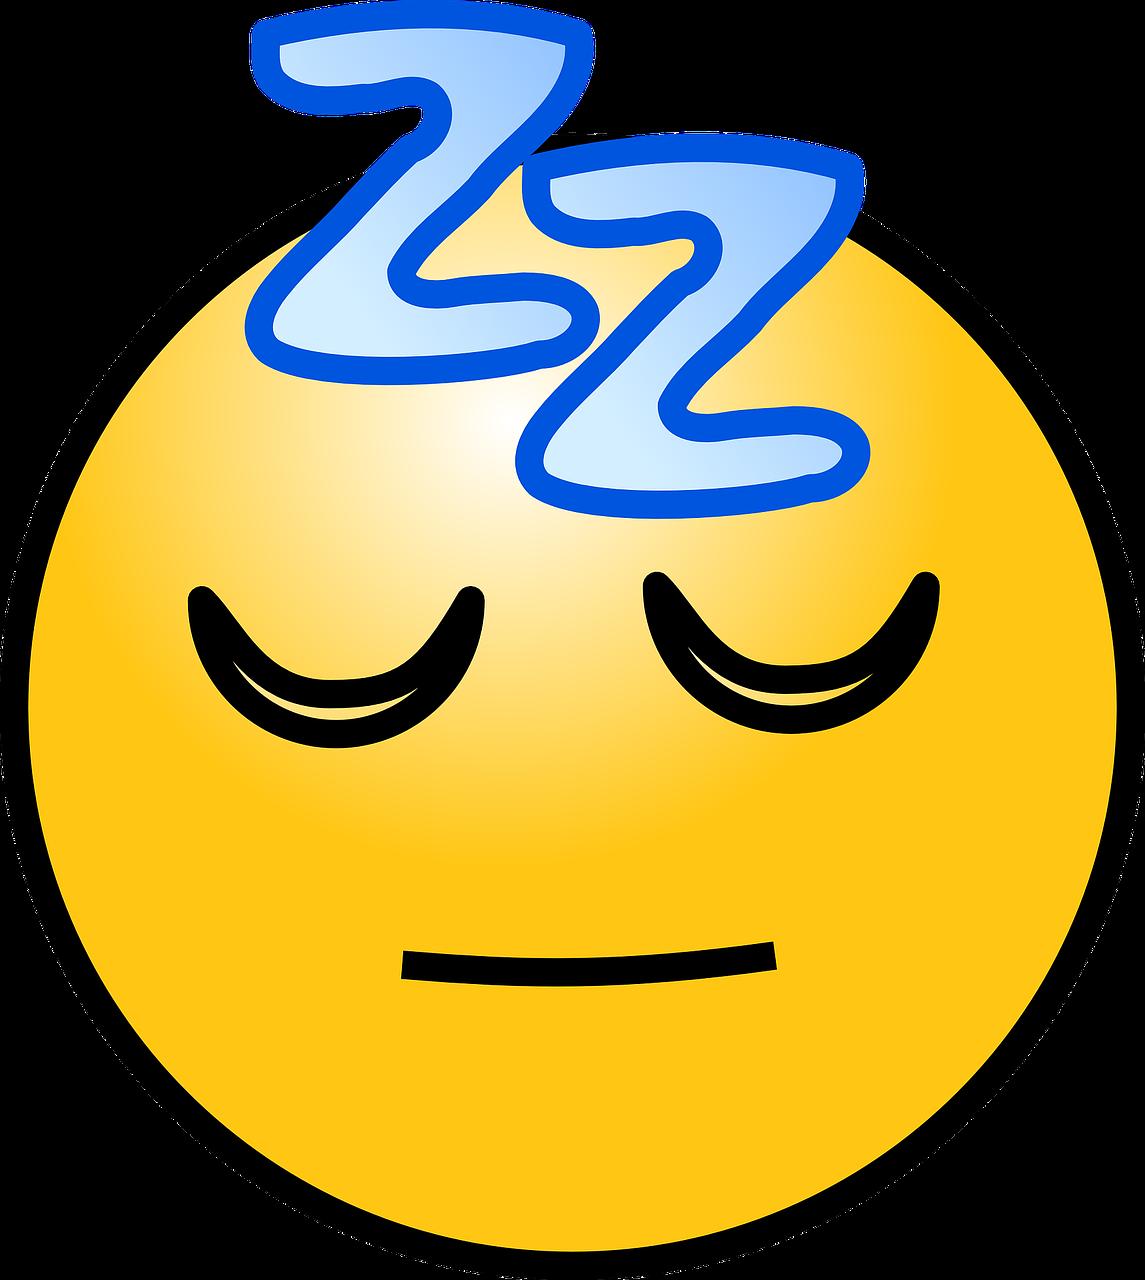 2016-02-10-5tipstohelpyoufallasleep-sleep